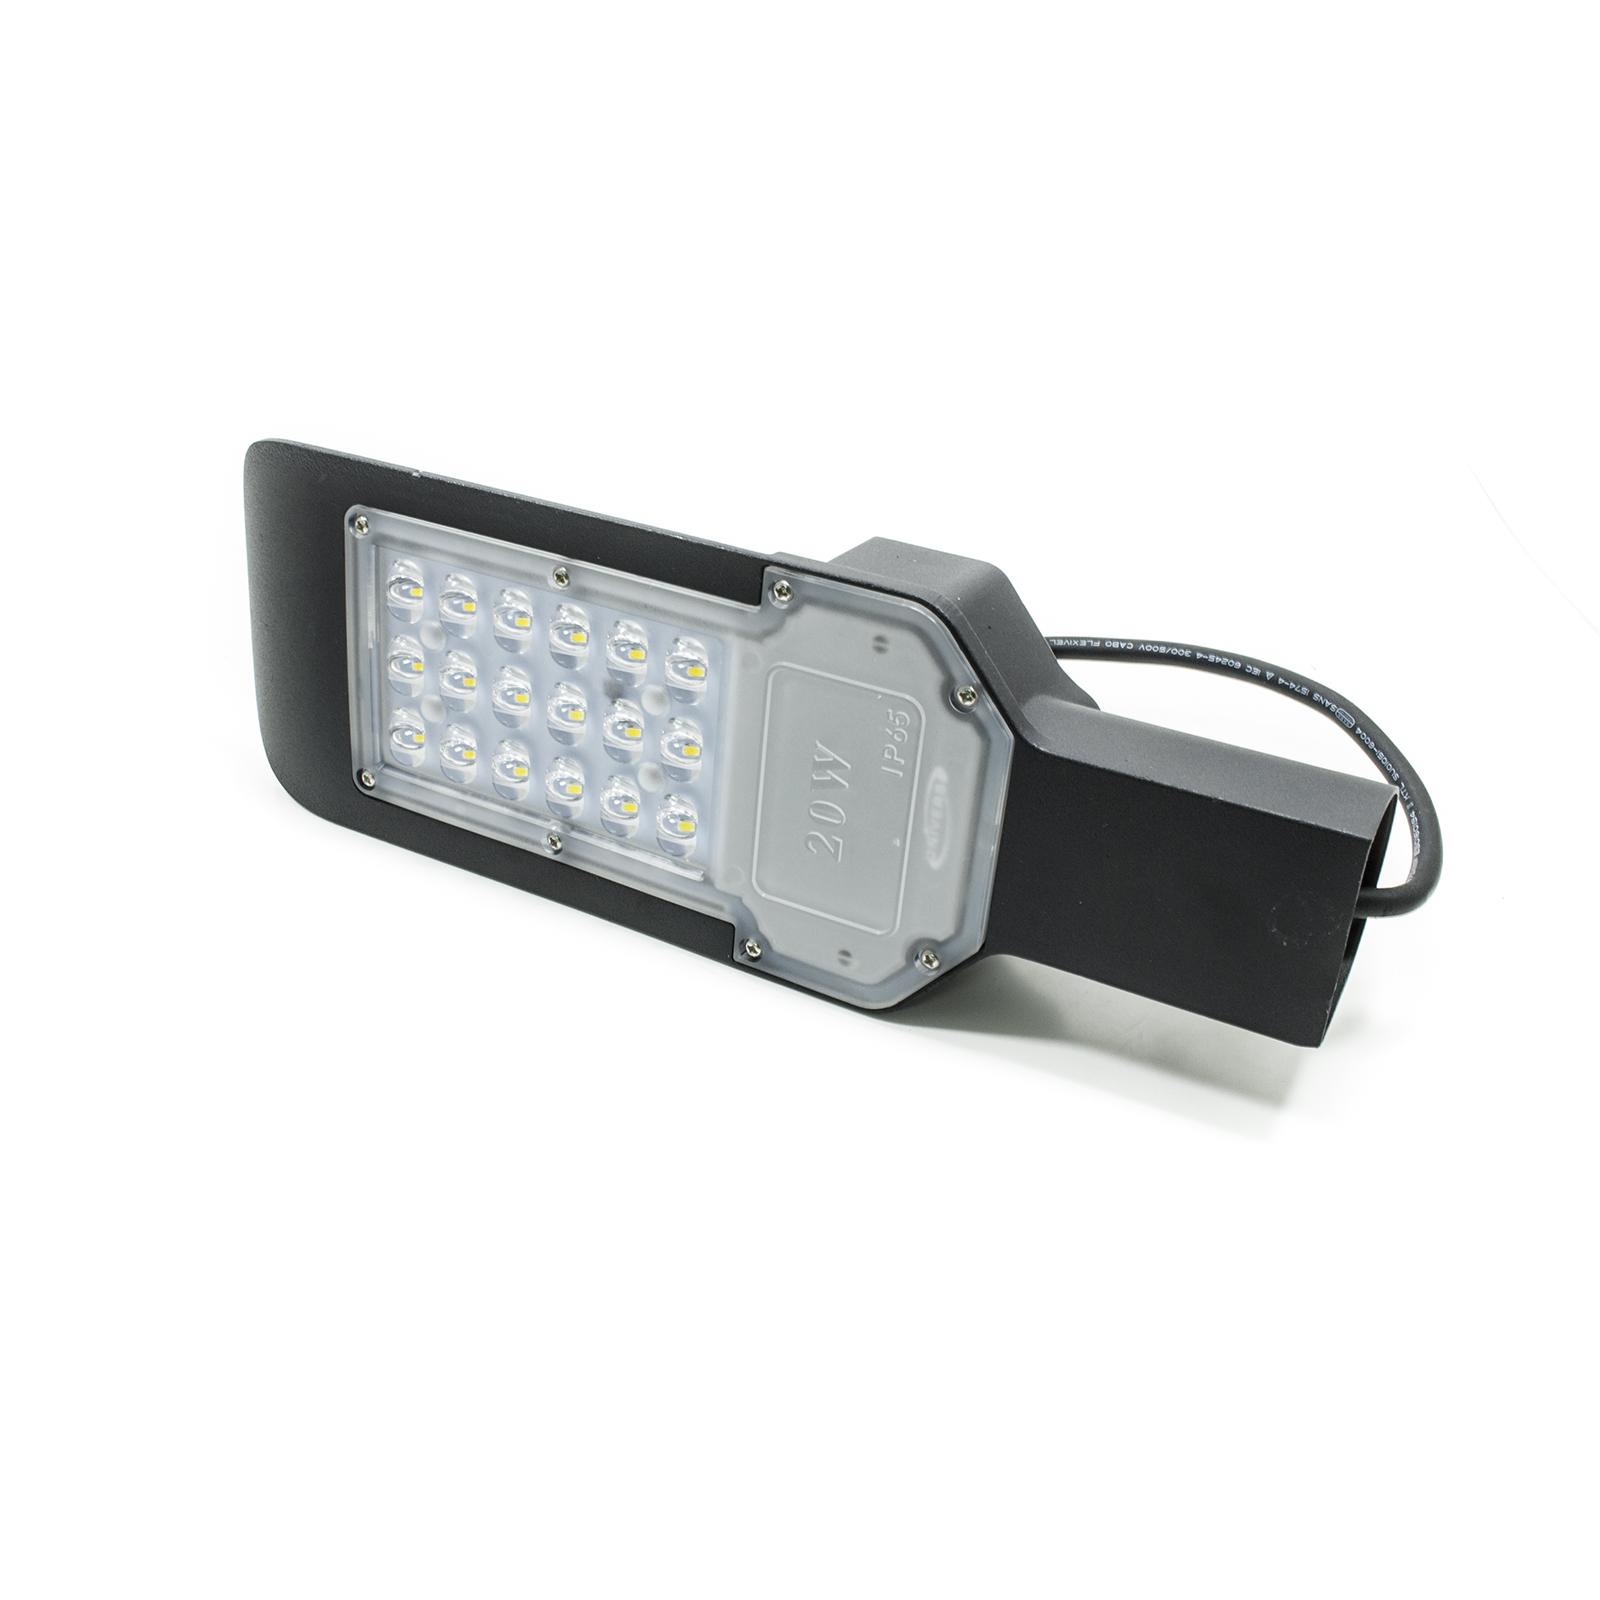 Faro led stradale armatura lampione palo parete luce industriale esterno ip65